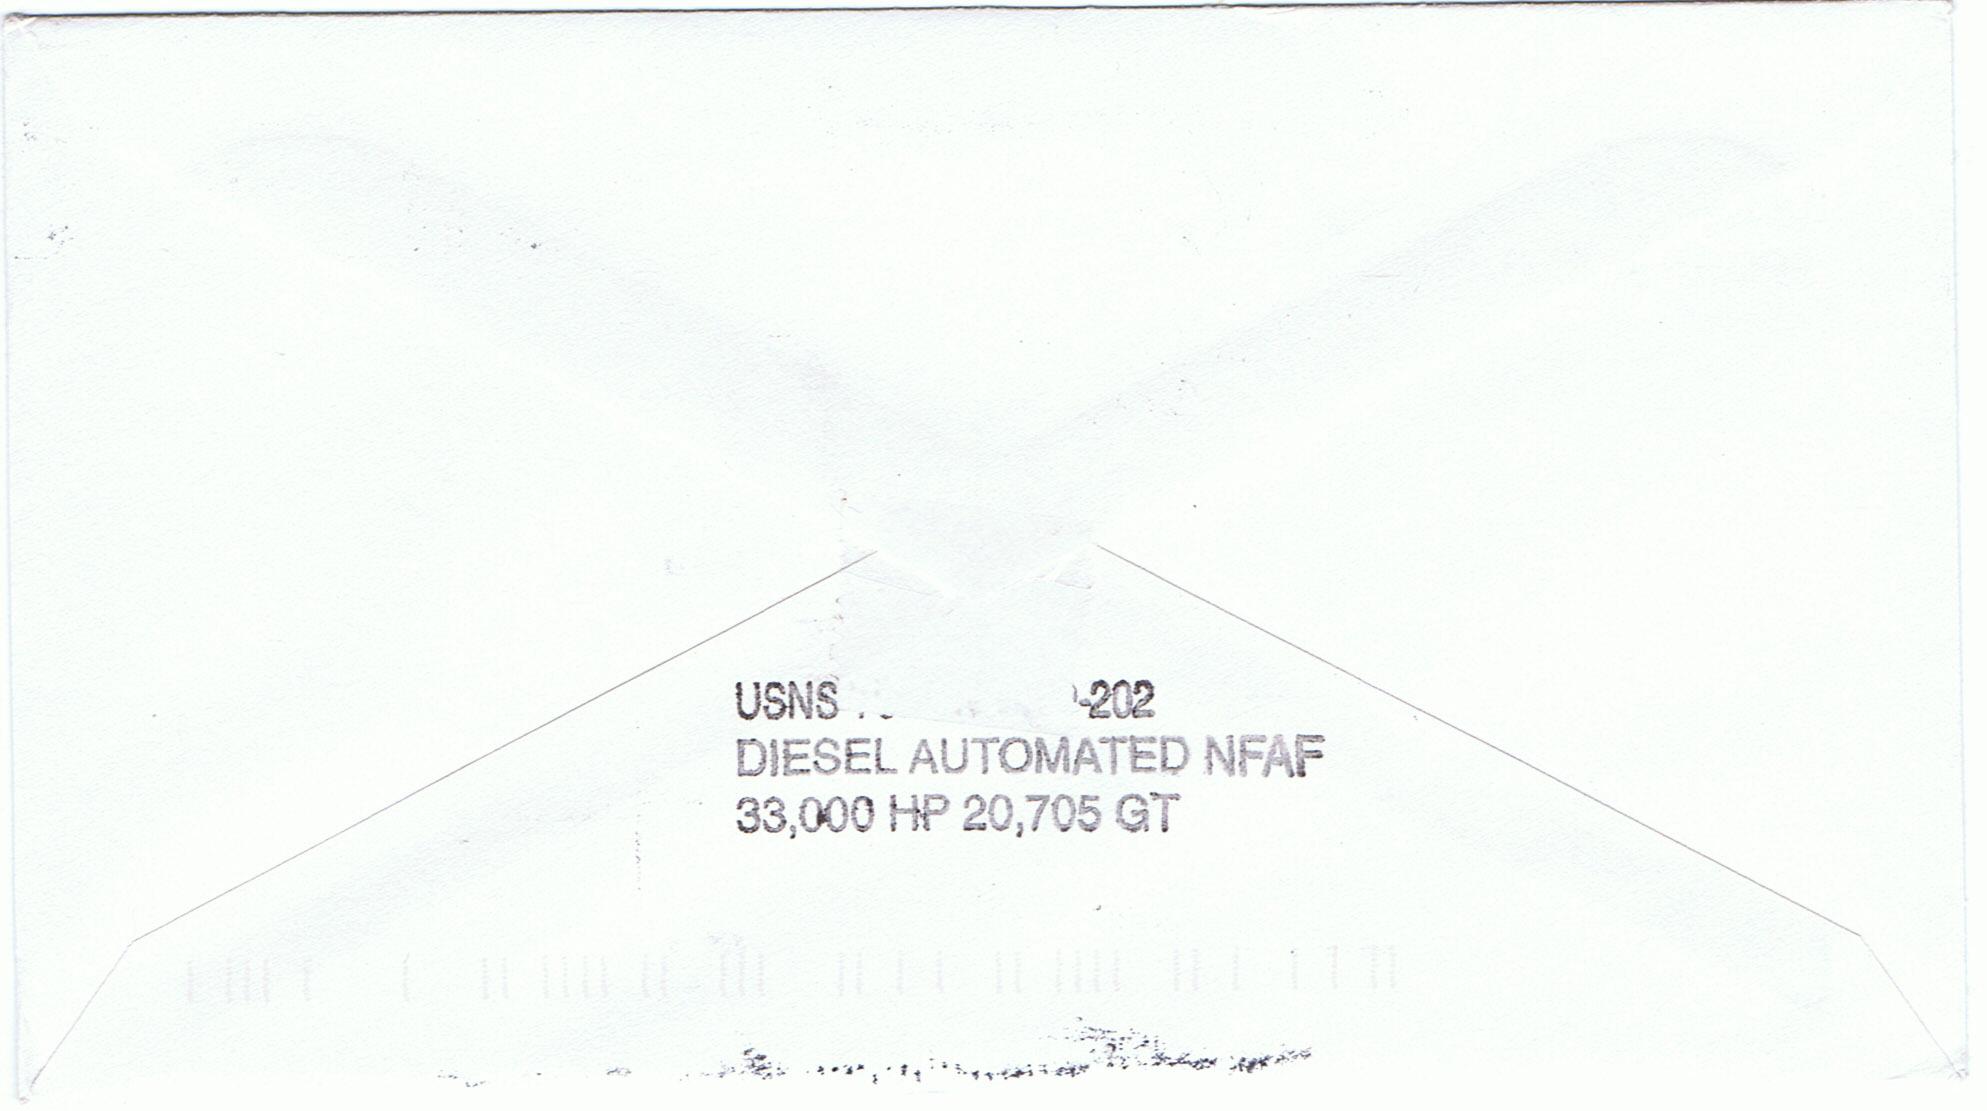 Beleg USNS YUKON T-AO 202 Rückseite von Dirk Rüstau